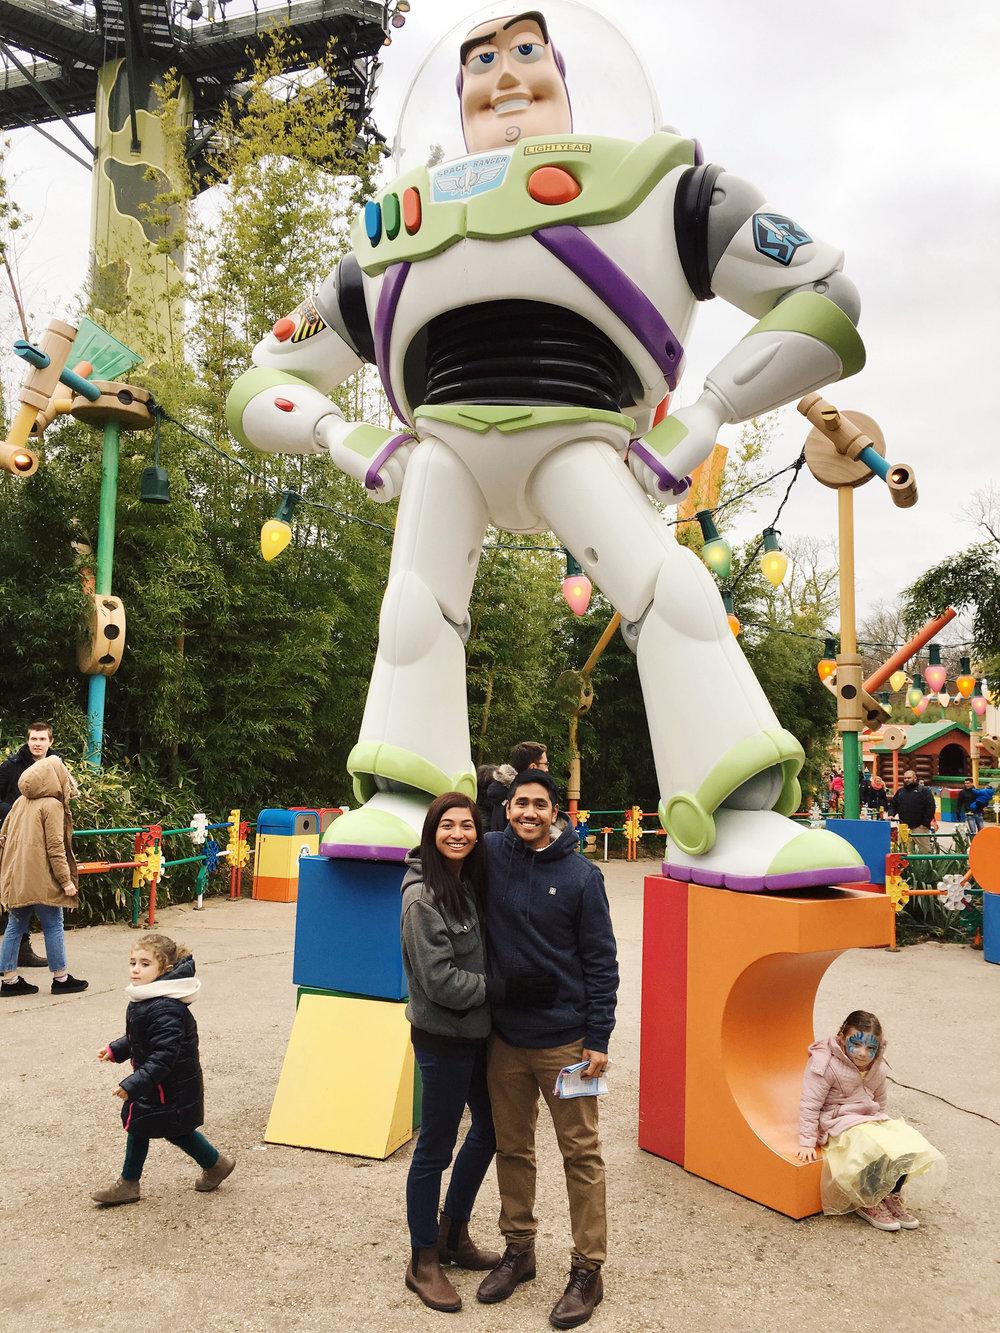 roxci vergs buzz lightyear toy story disneyland paris.JPG